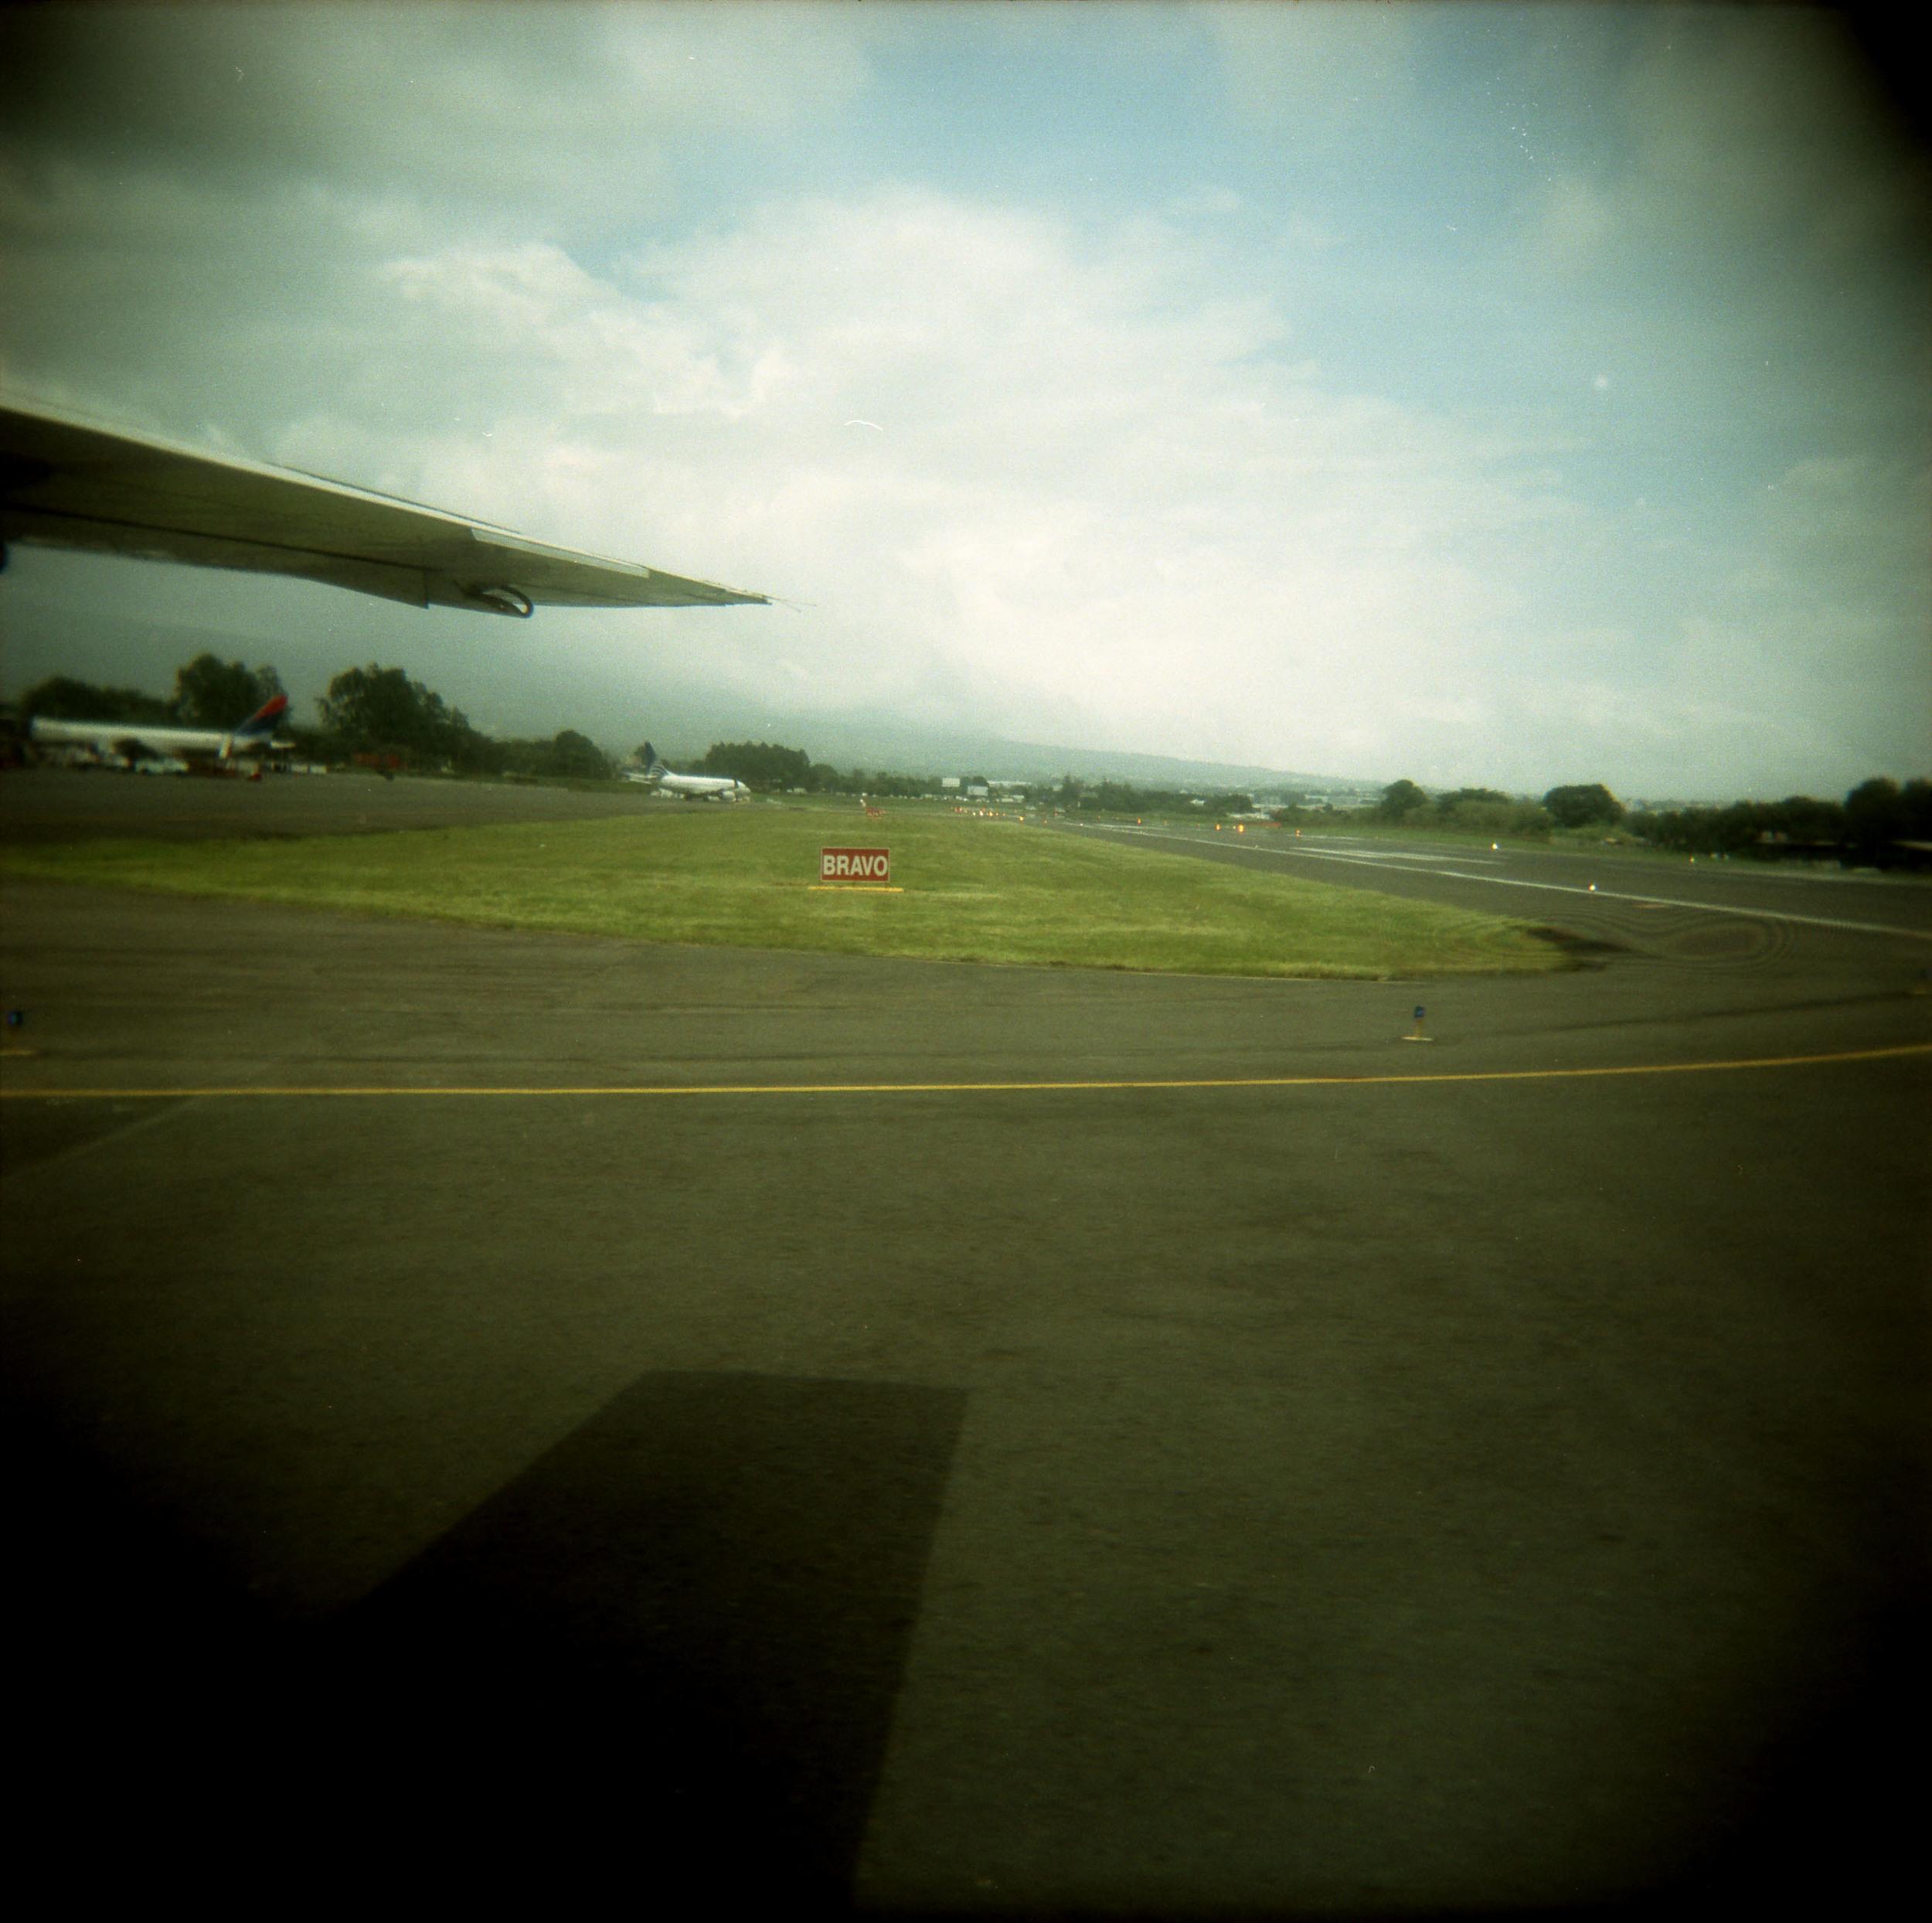 cr airport 3 copy.jpg